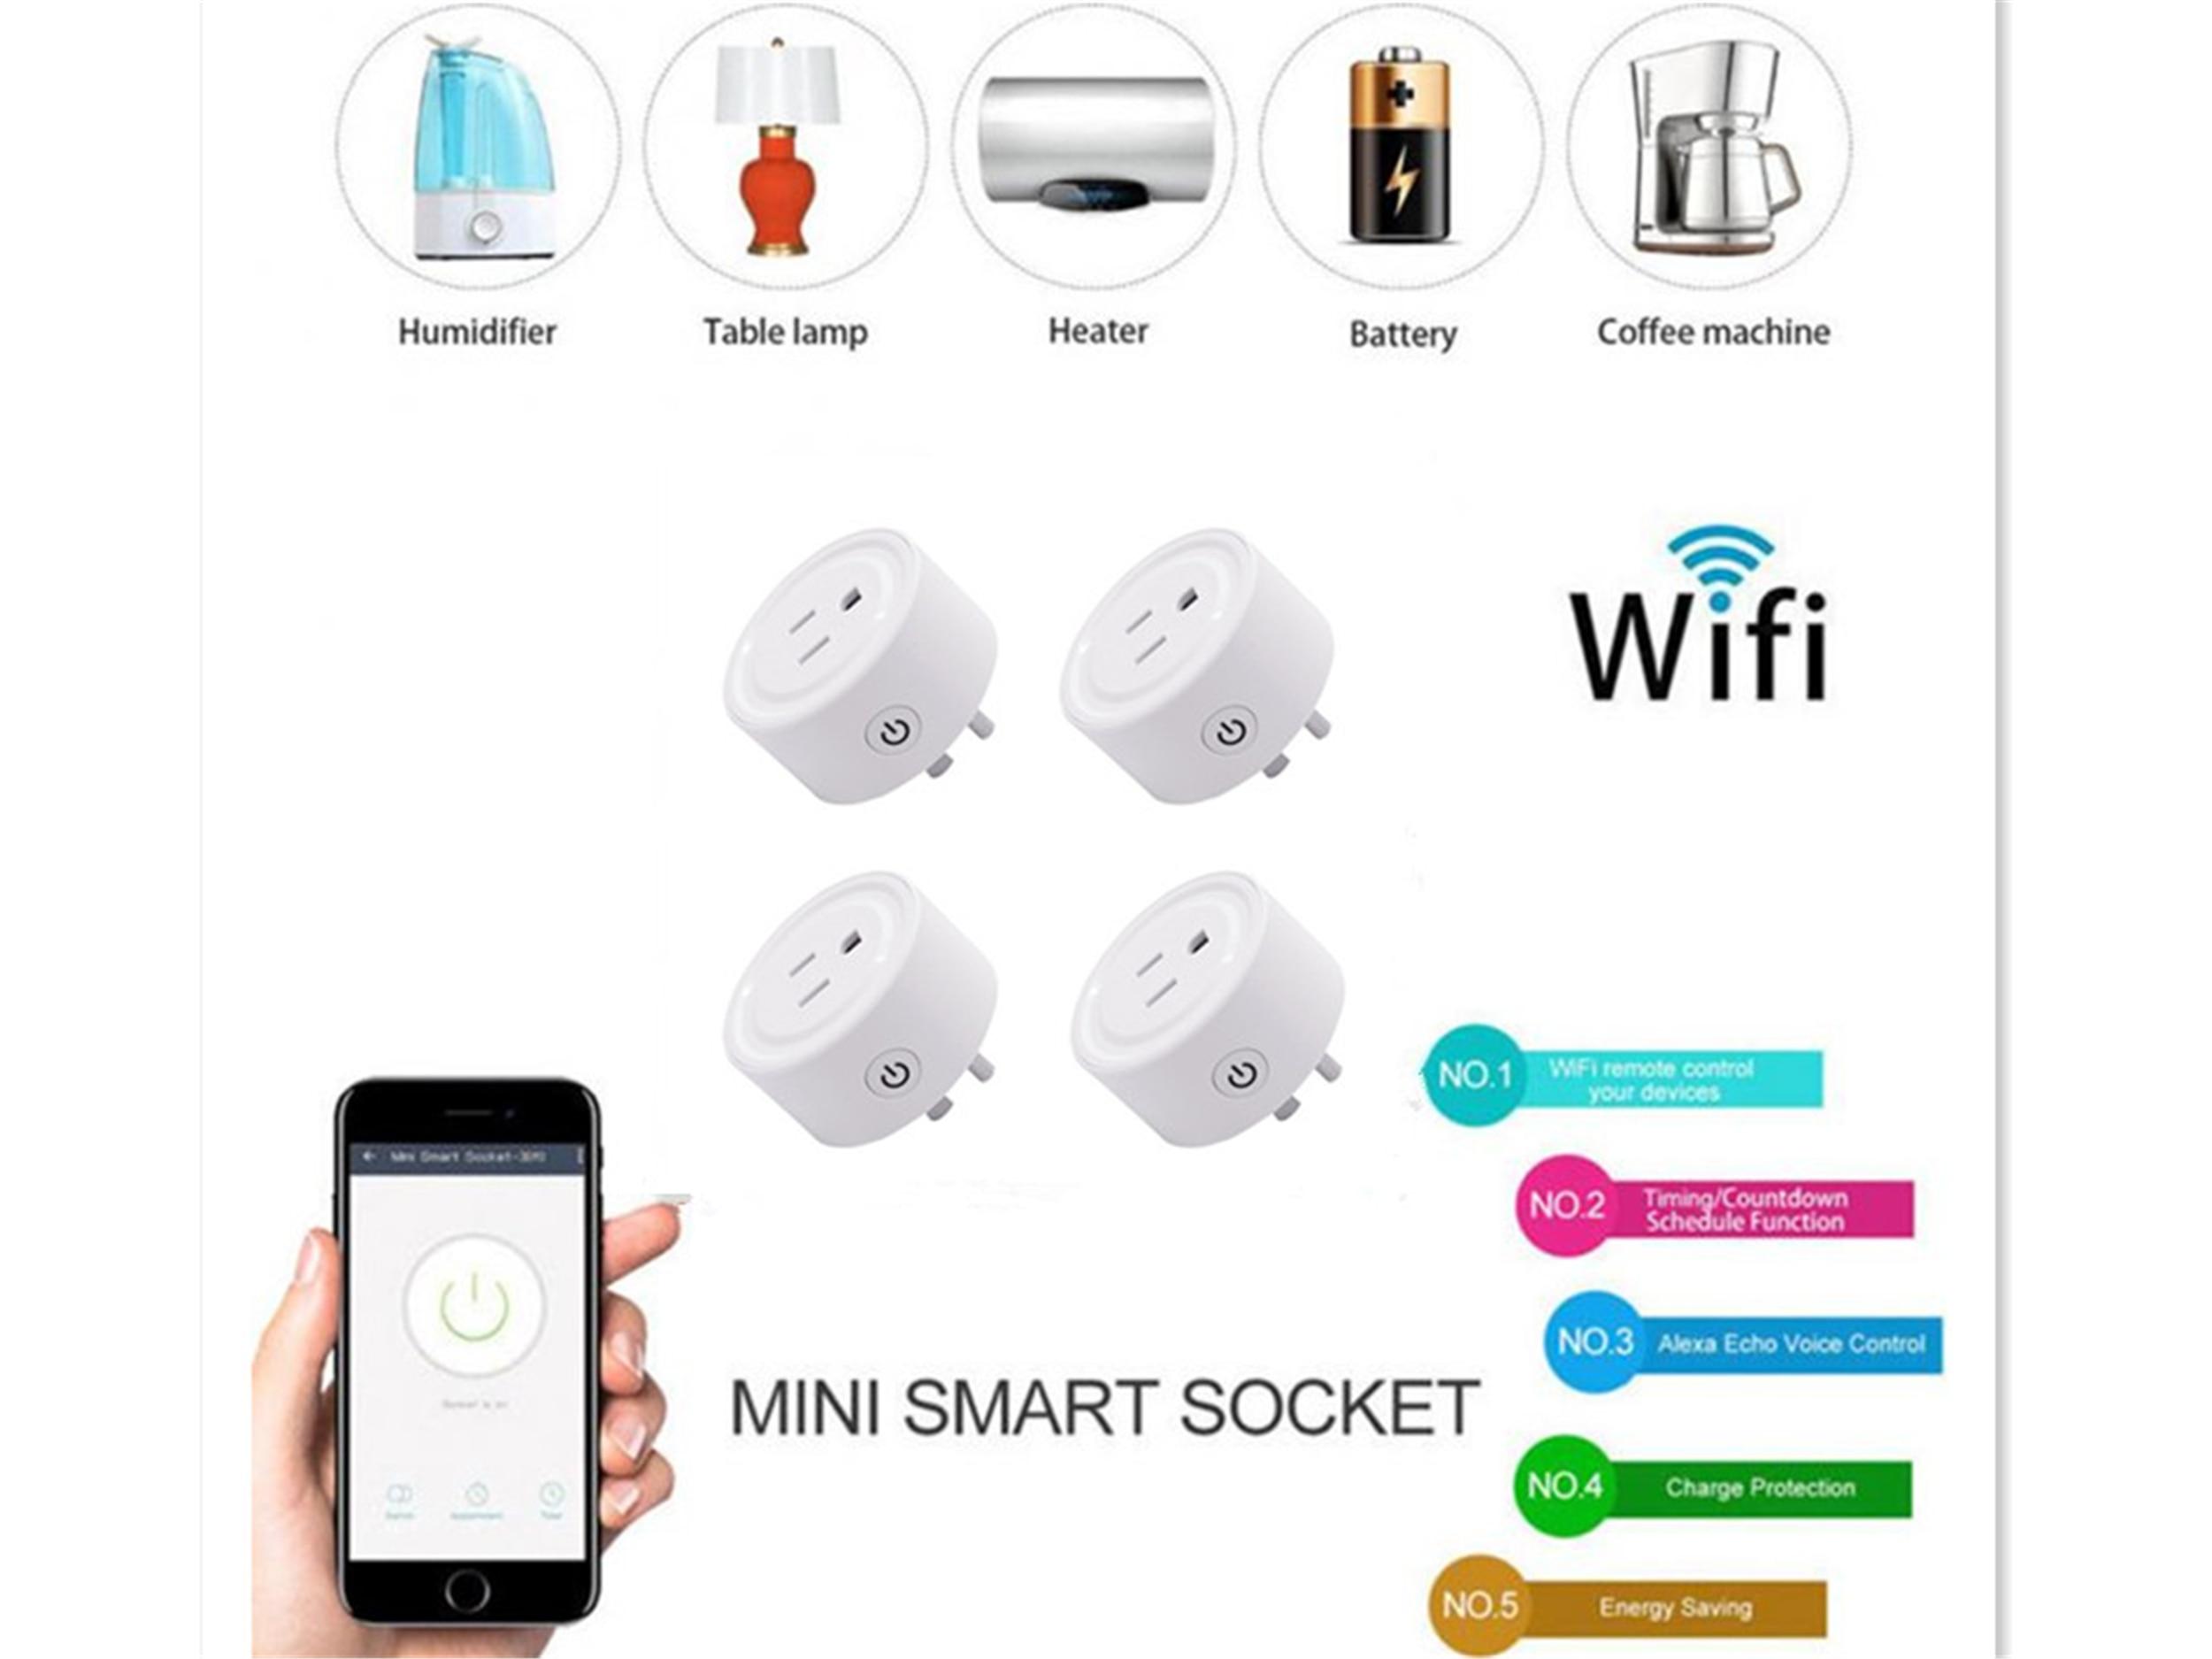 4 unids/lote Mini Wifi Smart Plug Control remoto inalámbrico funciona con Apple Homekit, Alexa, Google asistente FCC certificado